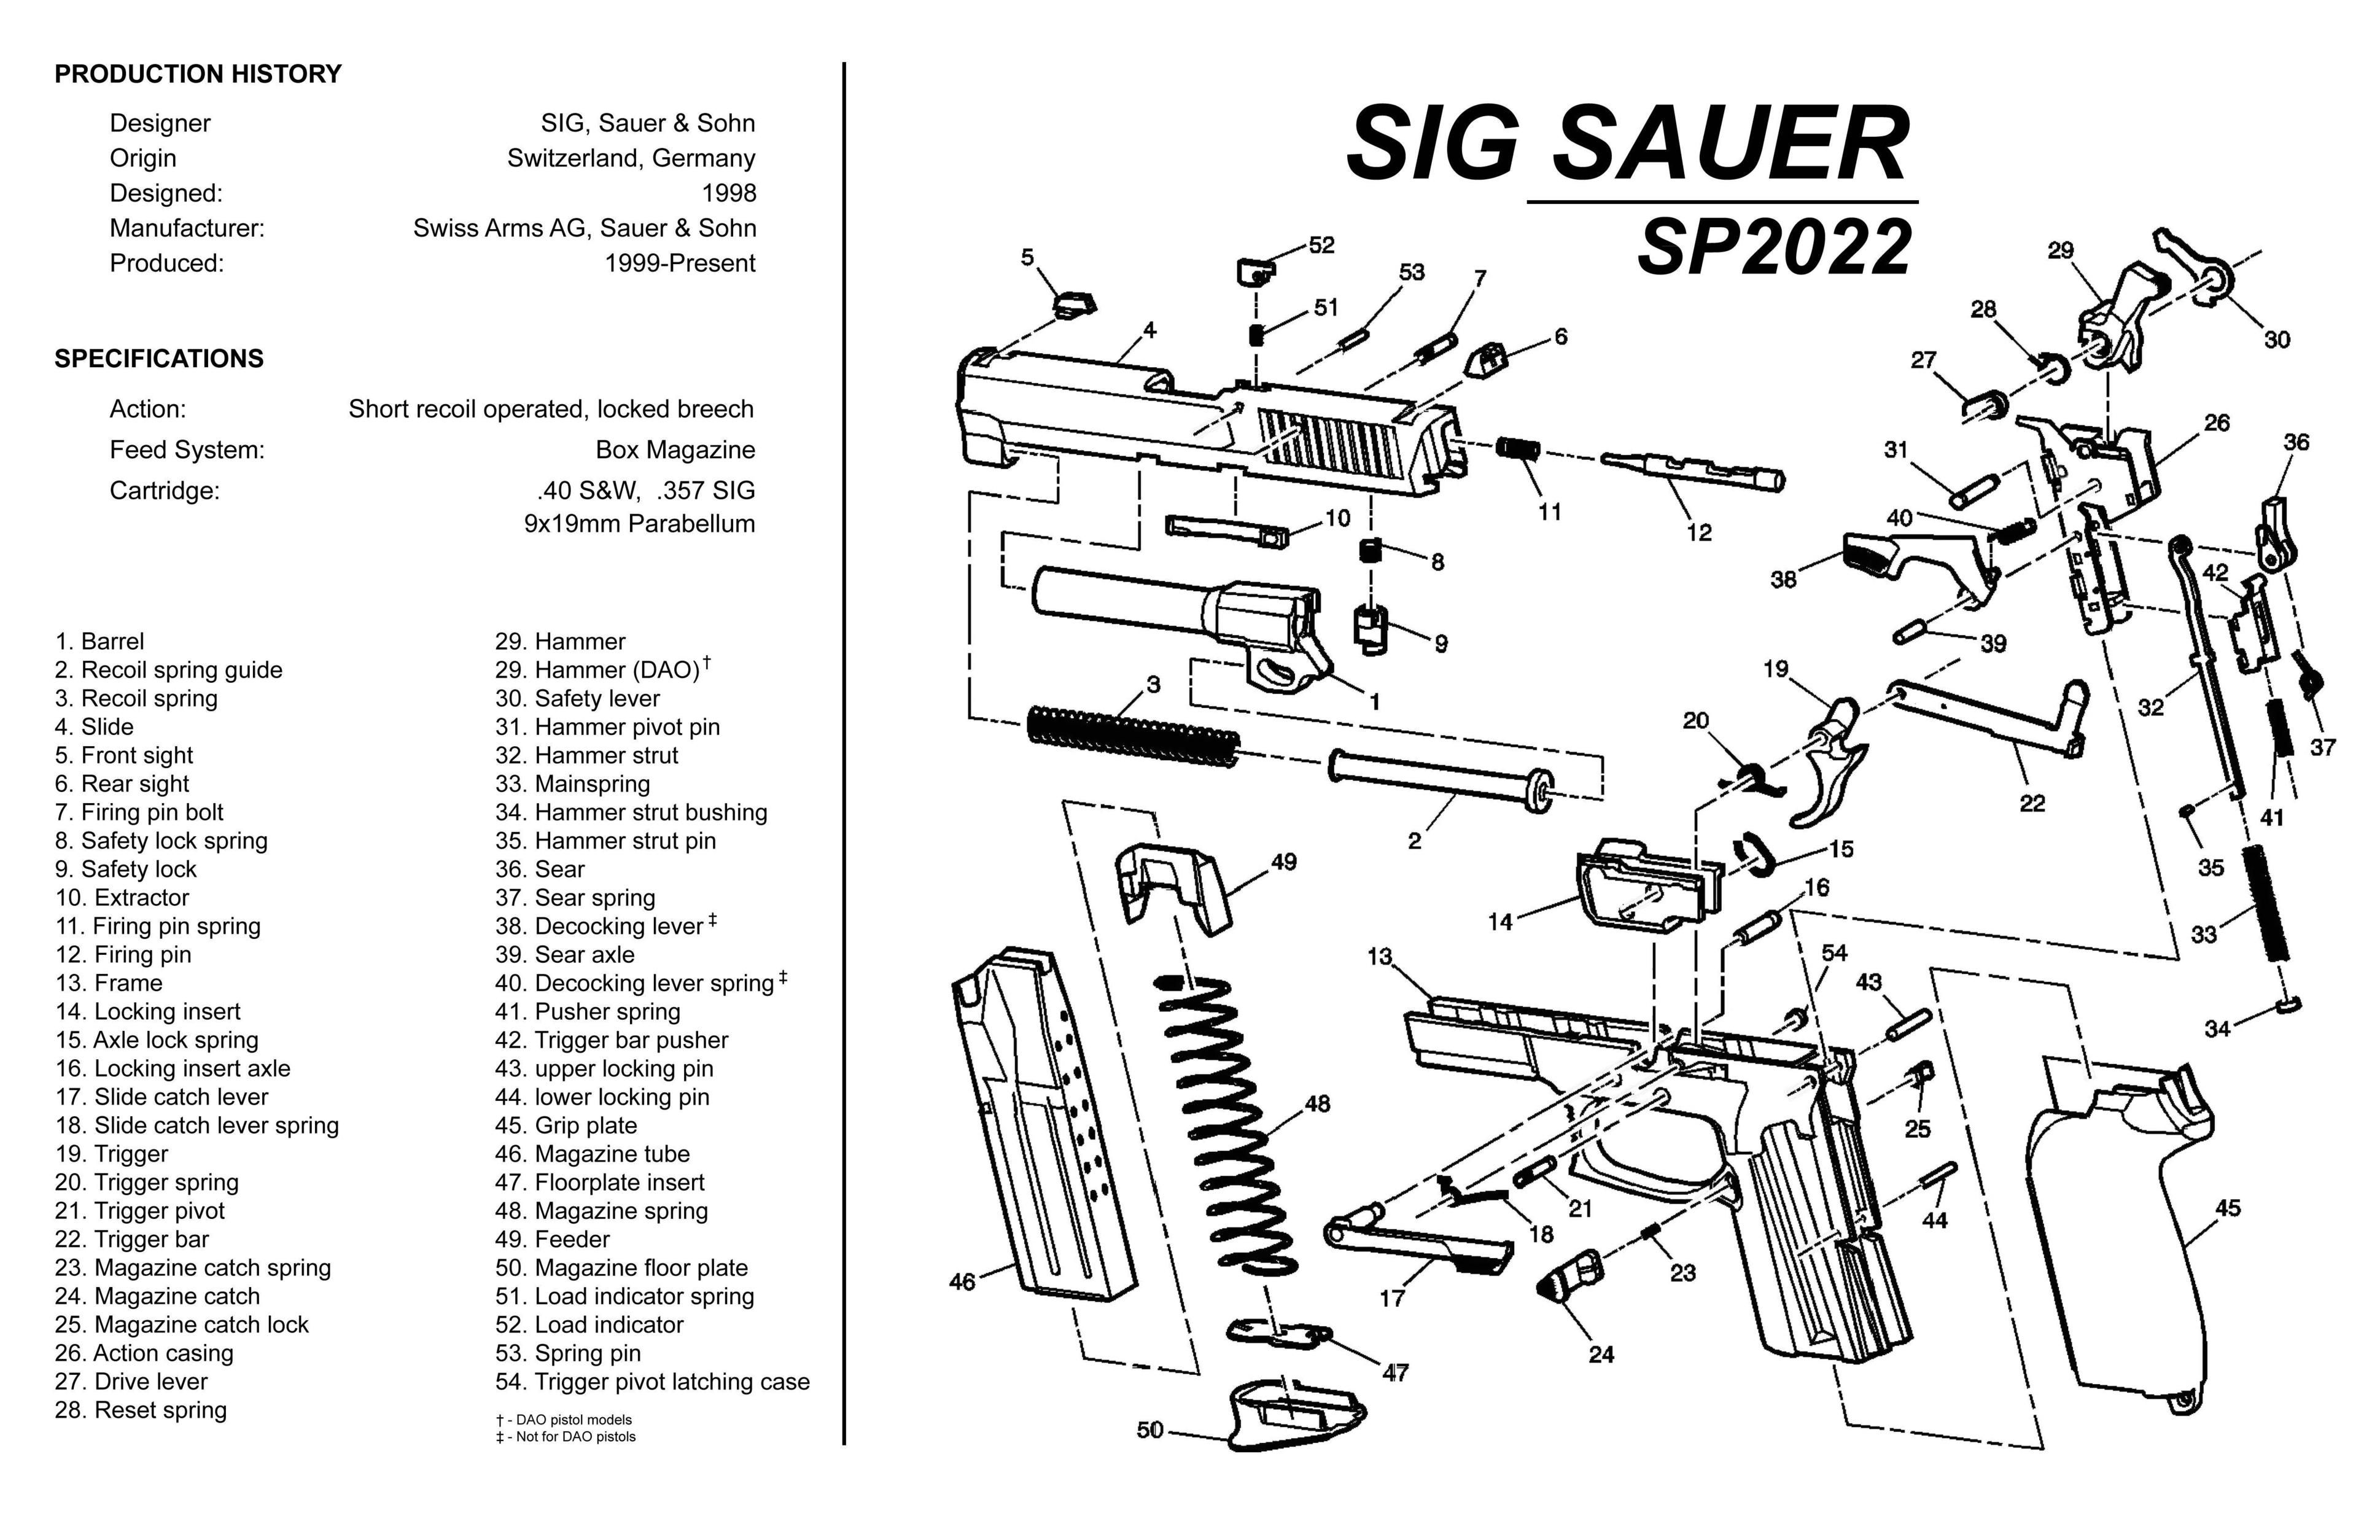 imgur post imgur sig sauer sig sg 550 guns and ammo firearms [ 3876 x 2508 Pixel ]